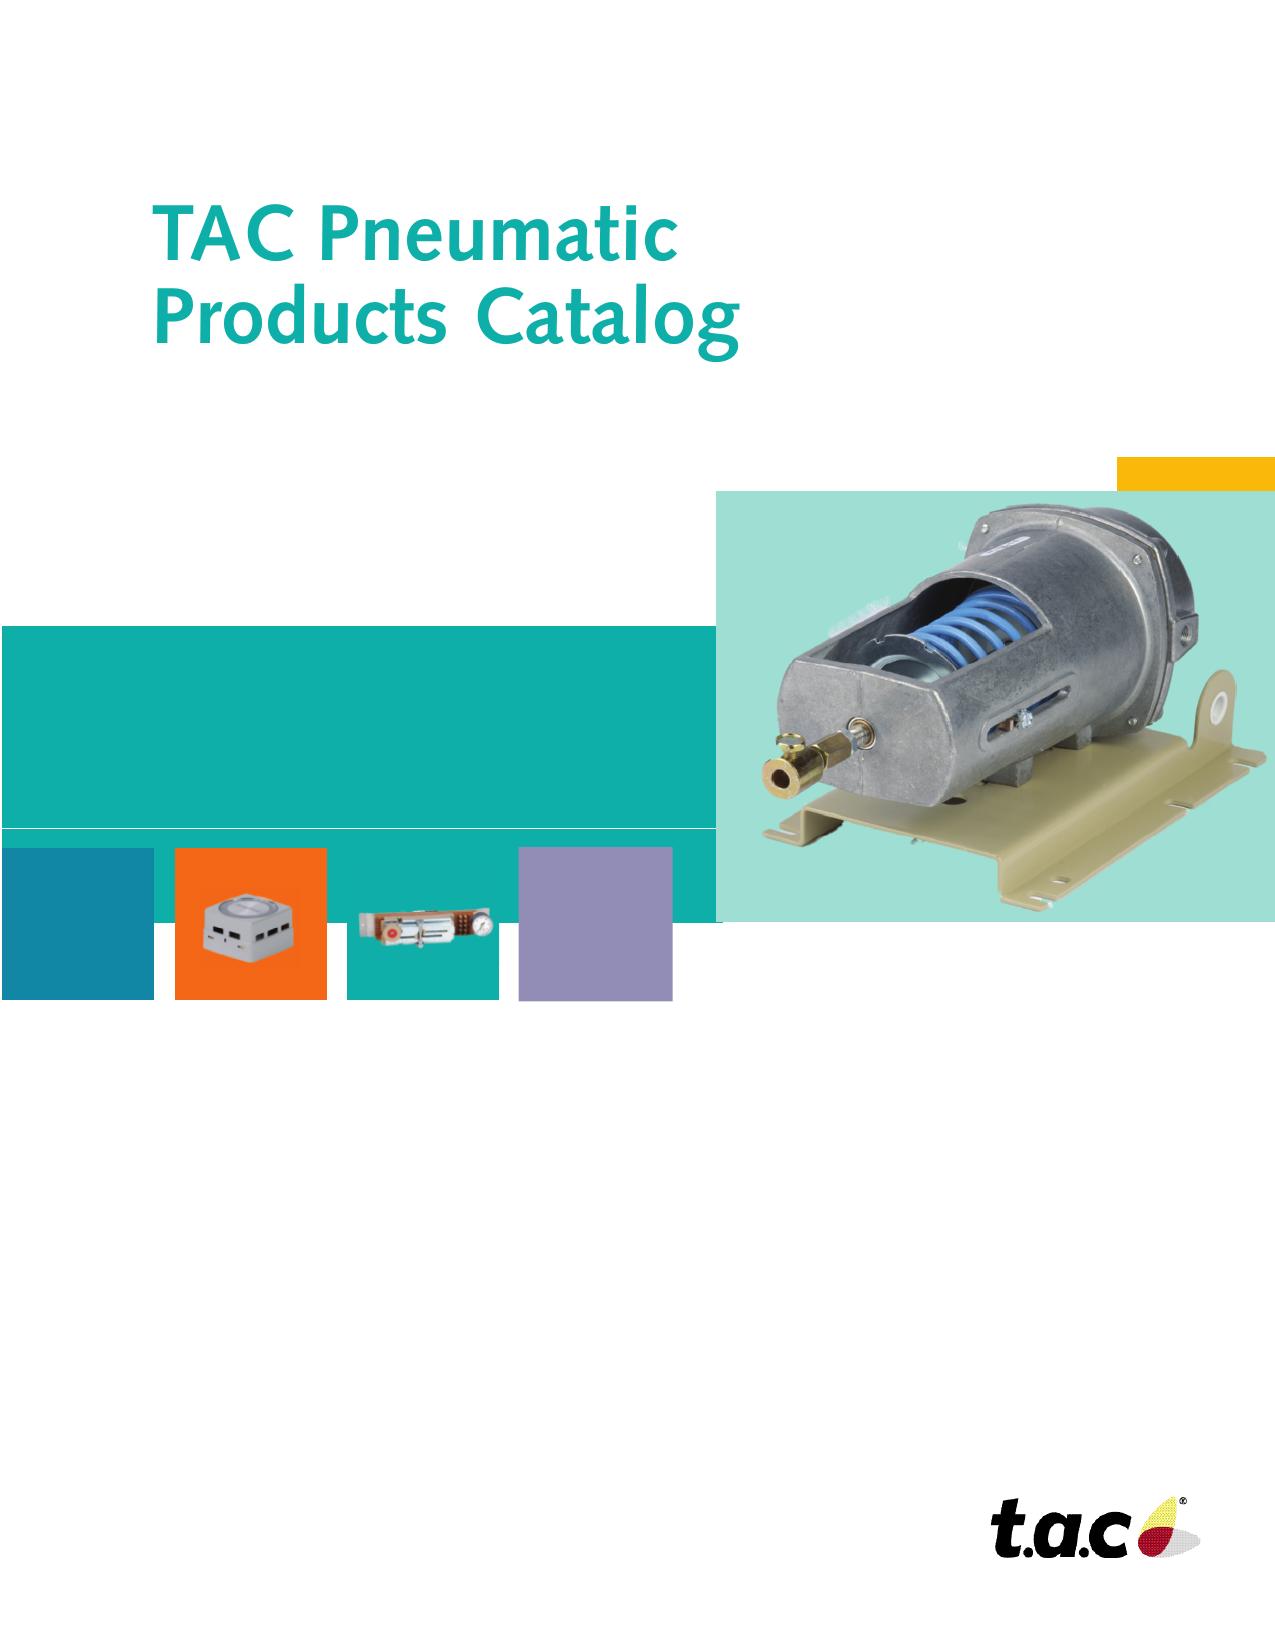 TAC Pneumatic Products Catalog   manualzz.com